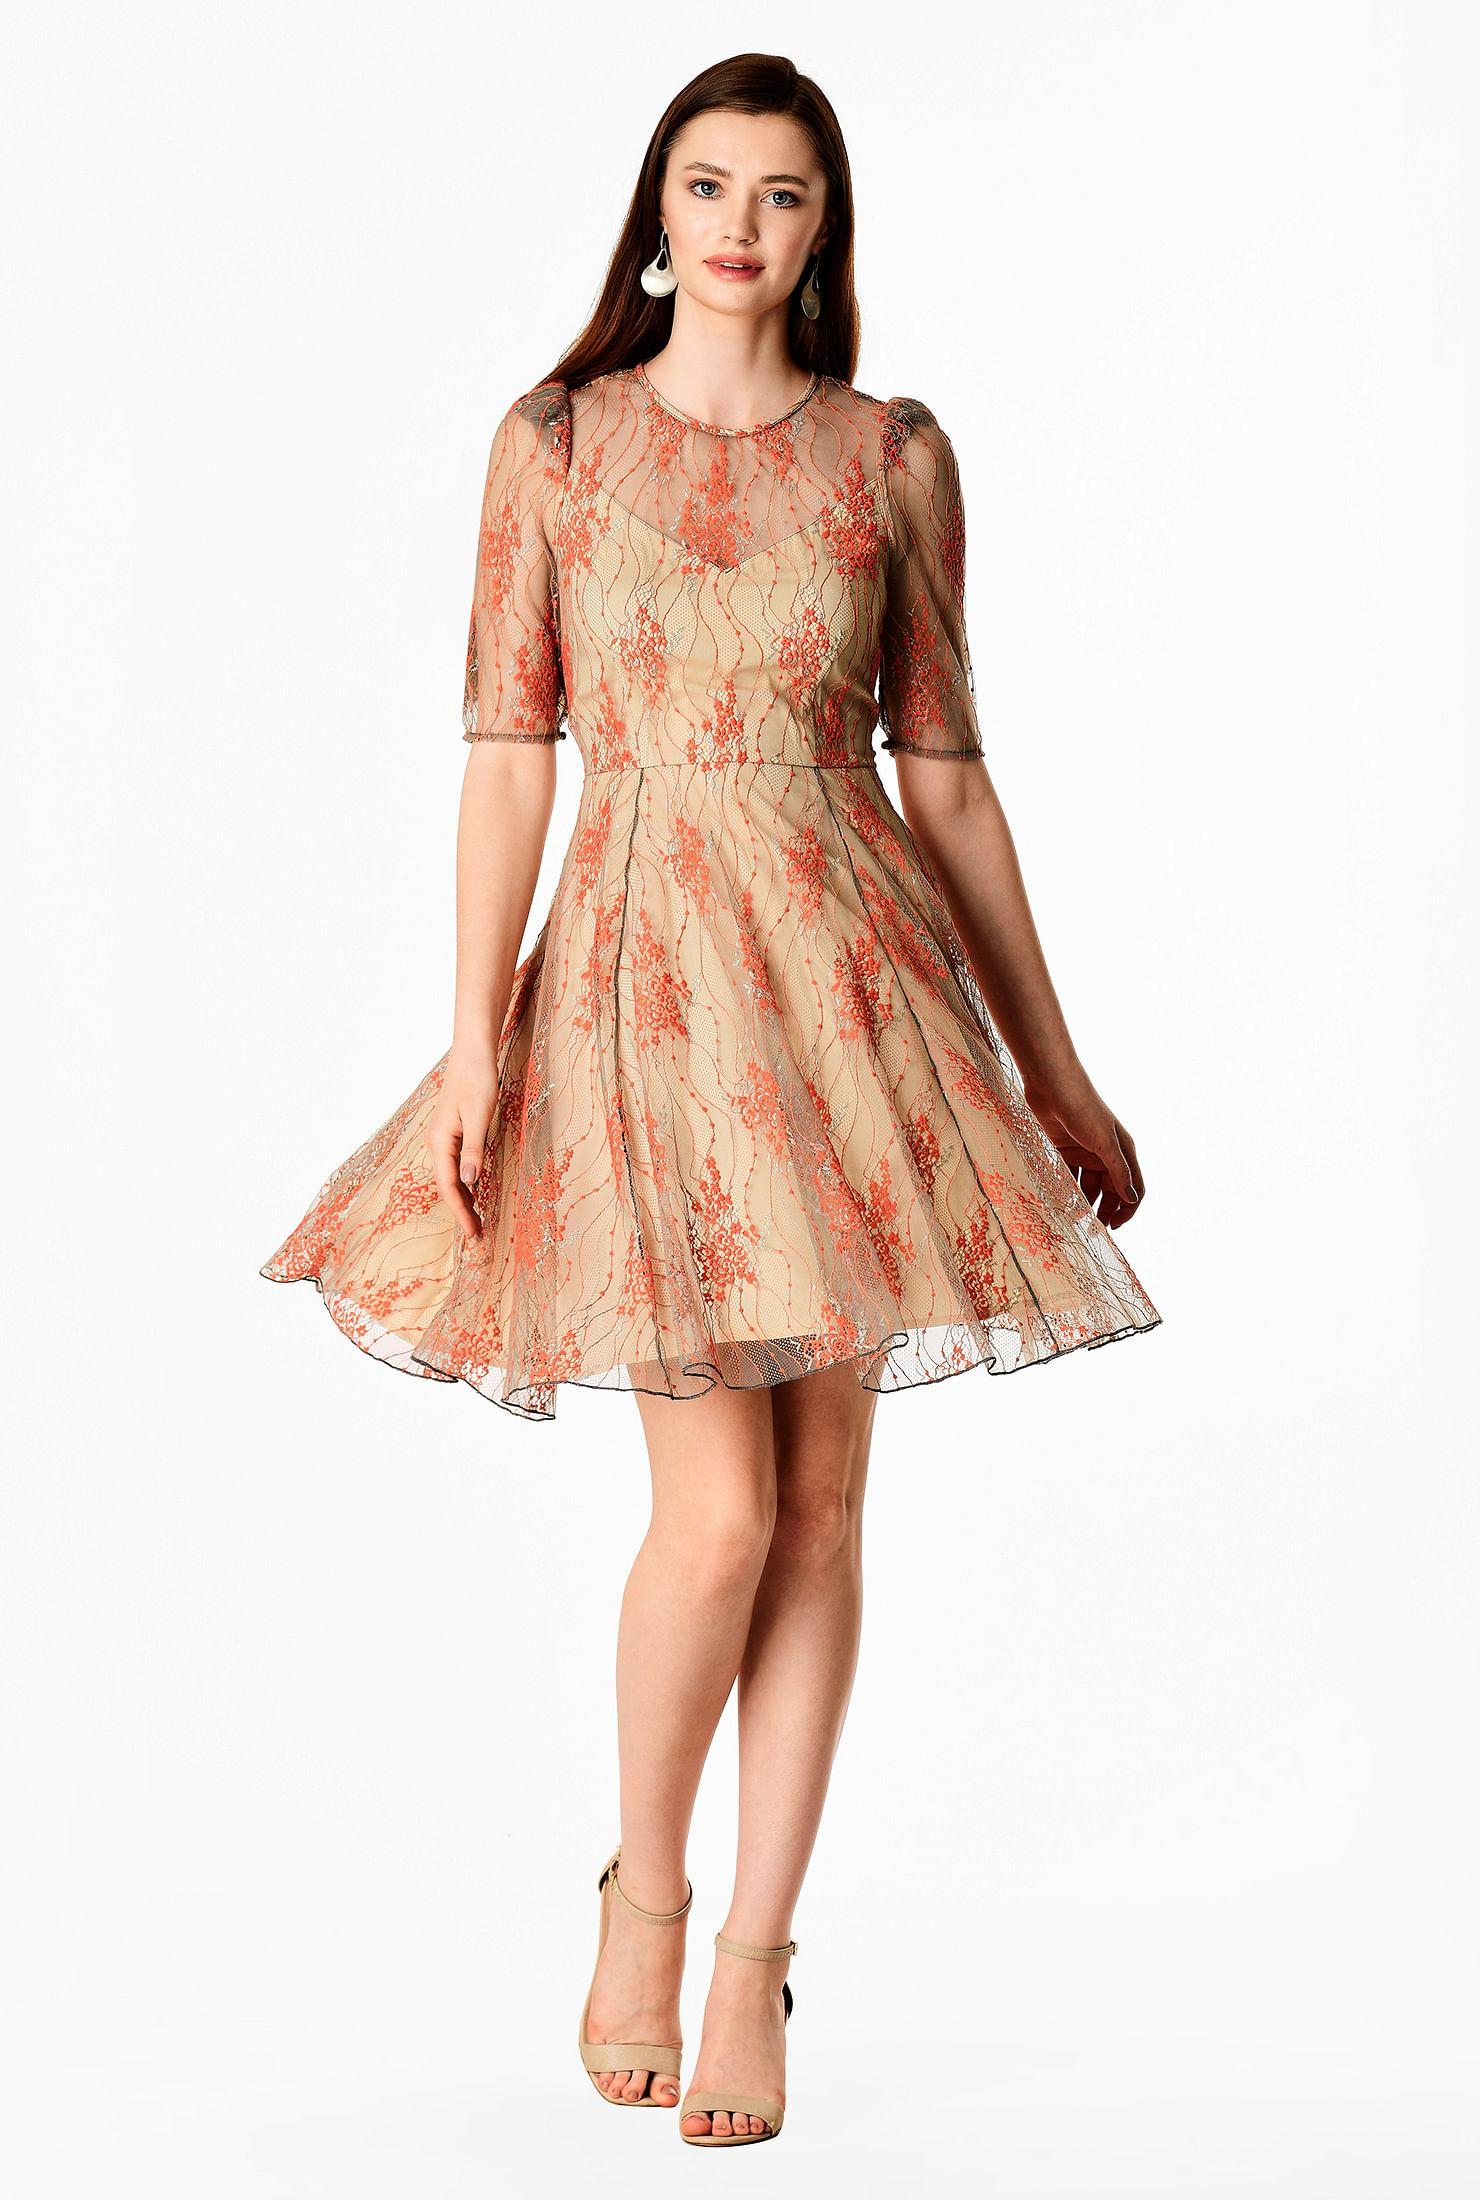 Illusion floral lace skater dress